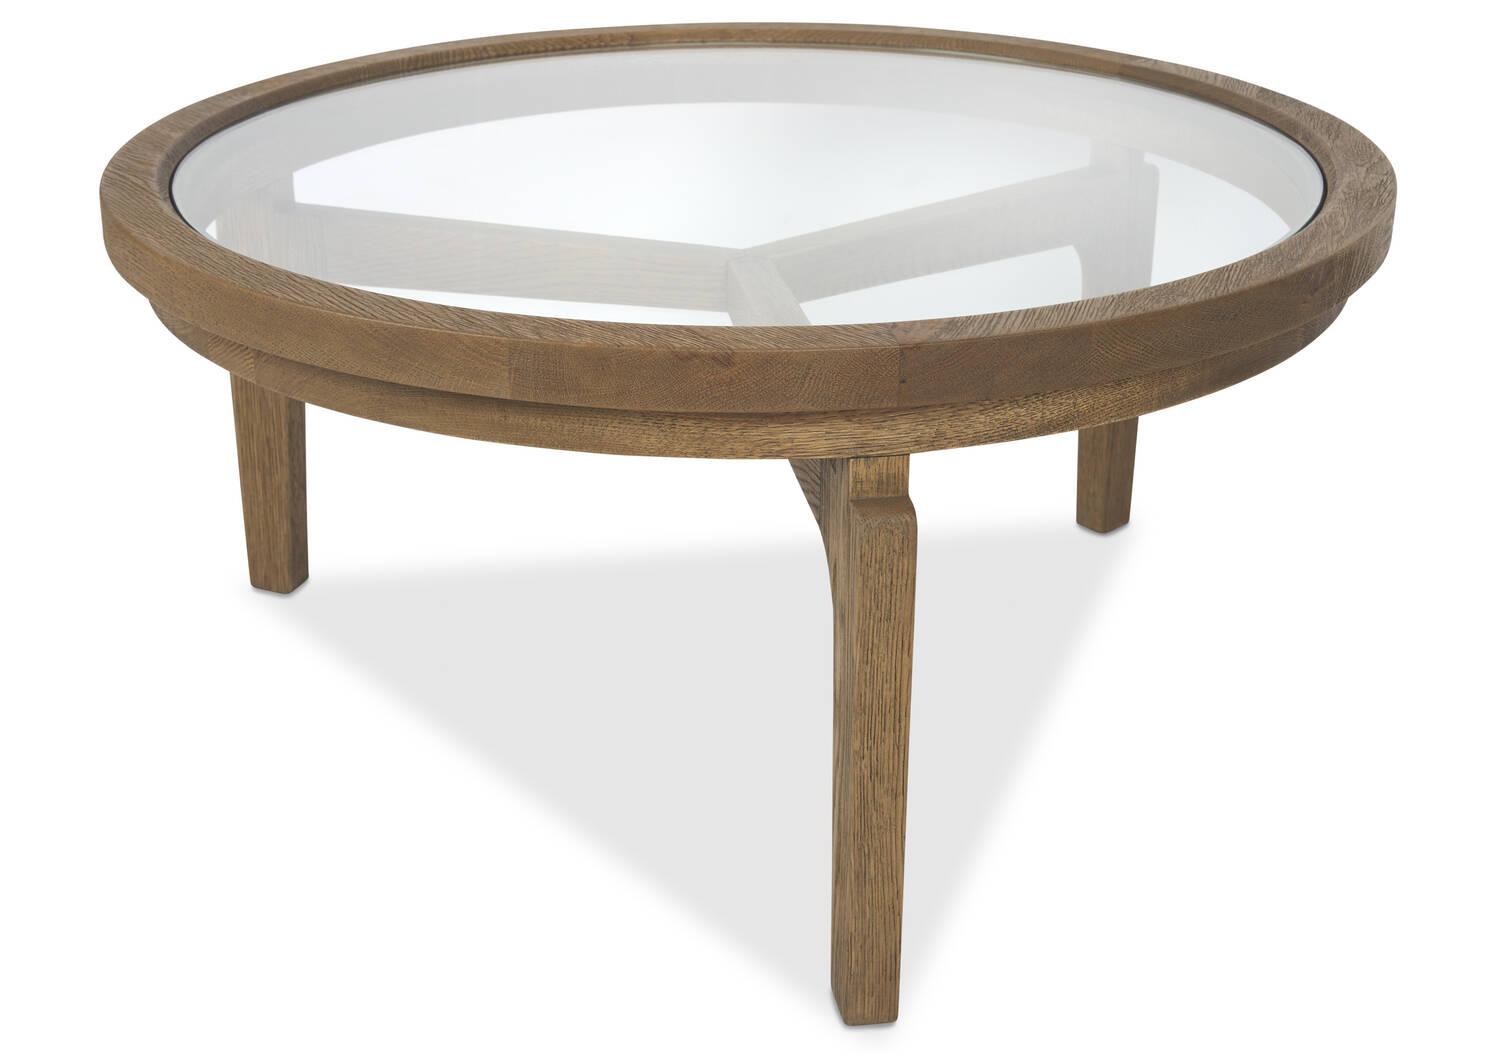 Wilson Coffee Table -Miro Barley